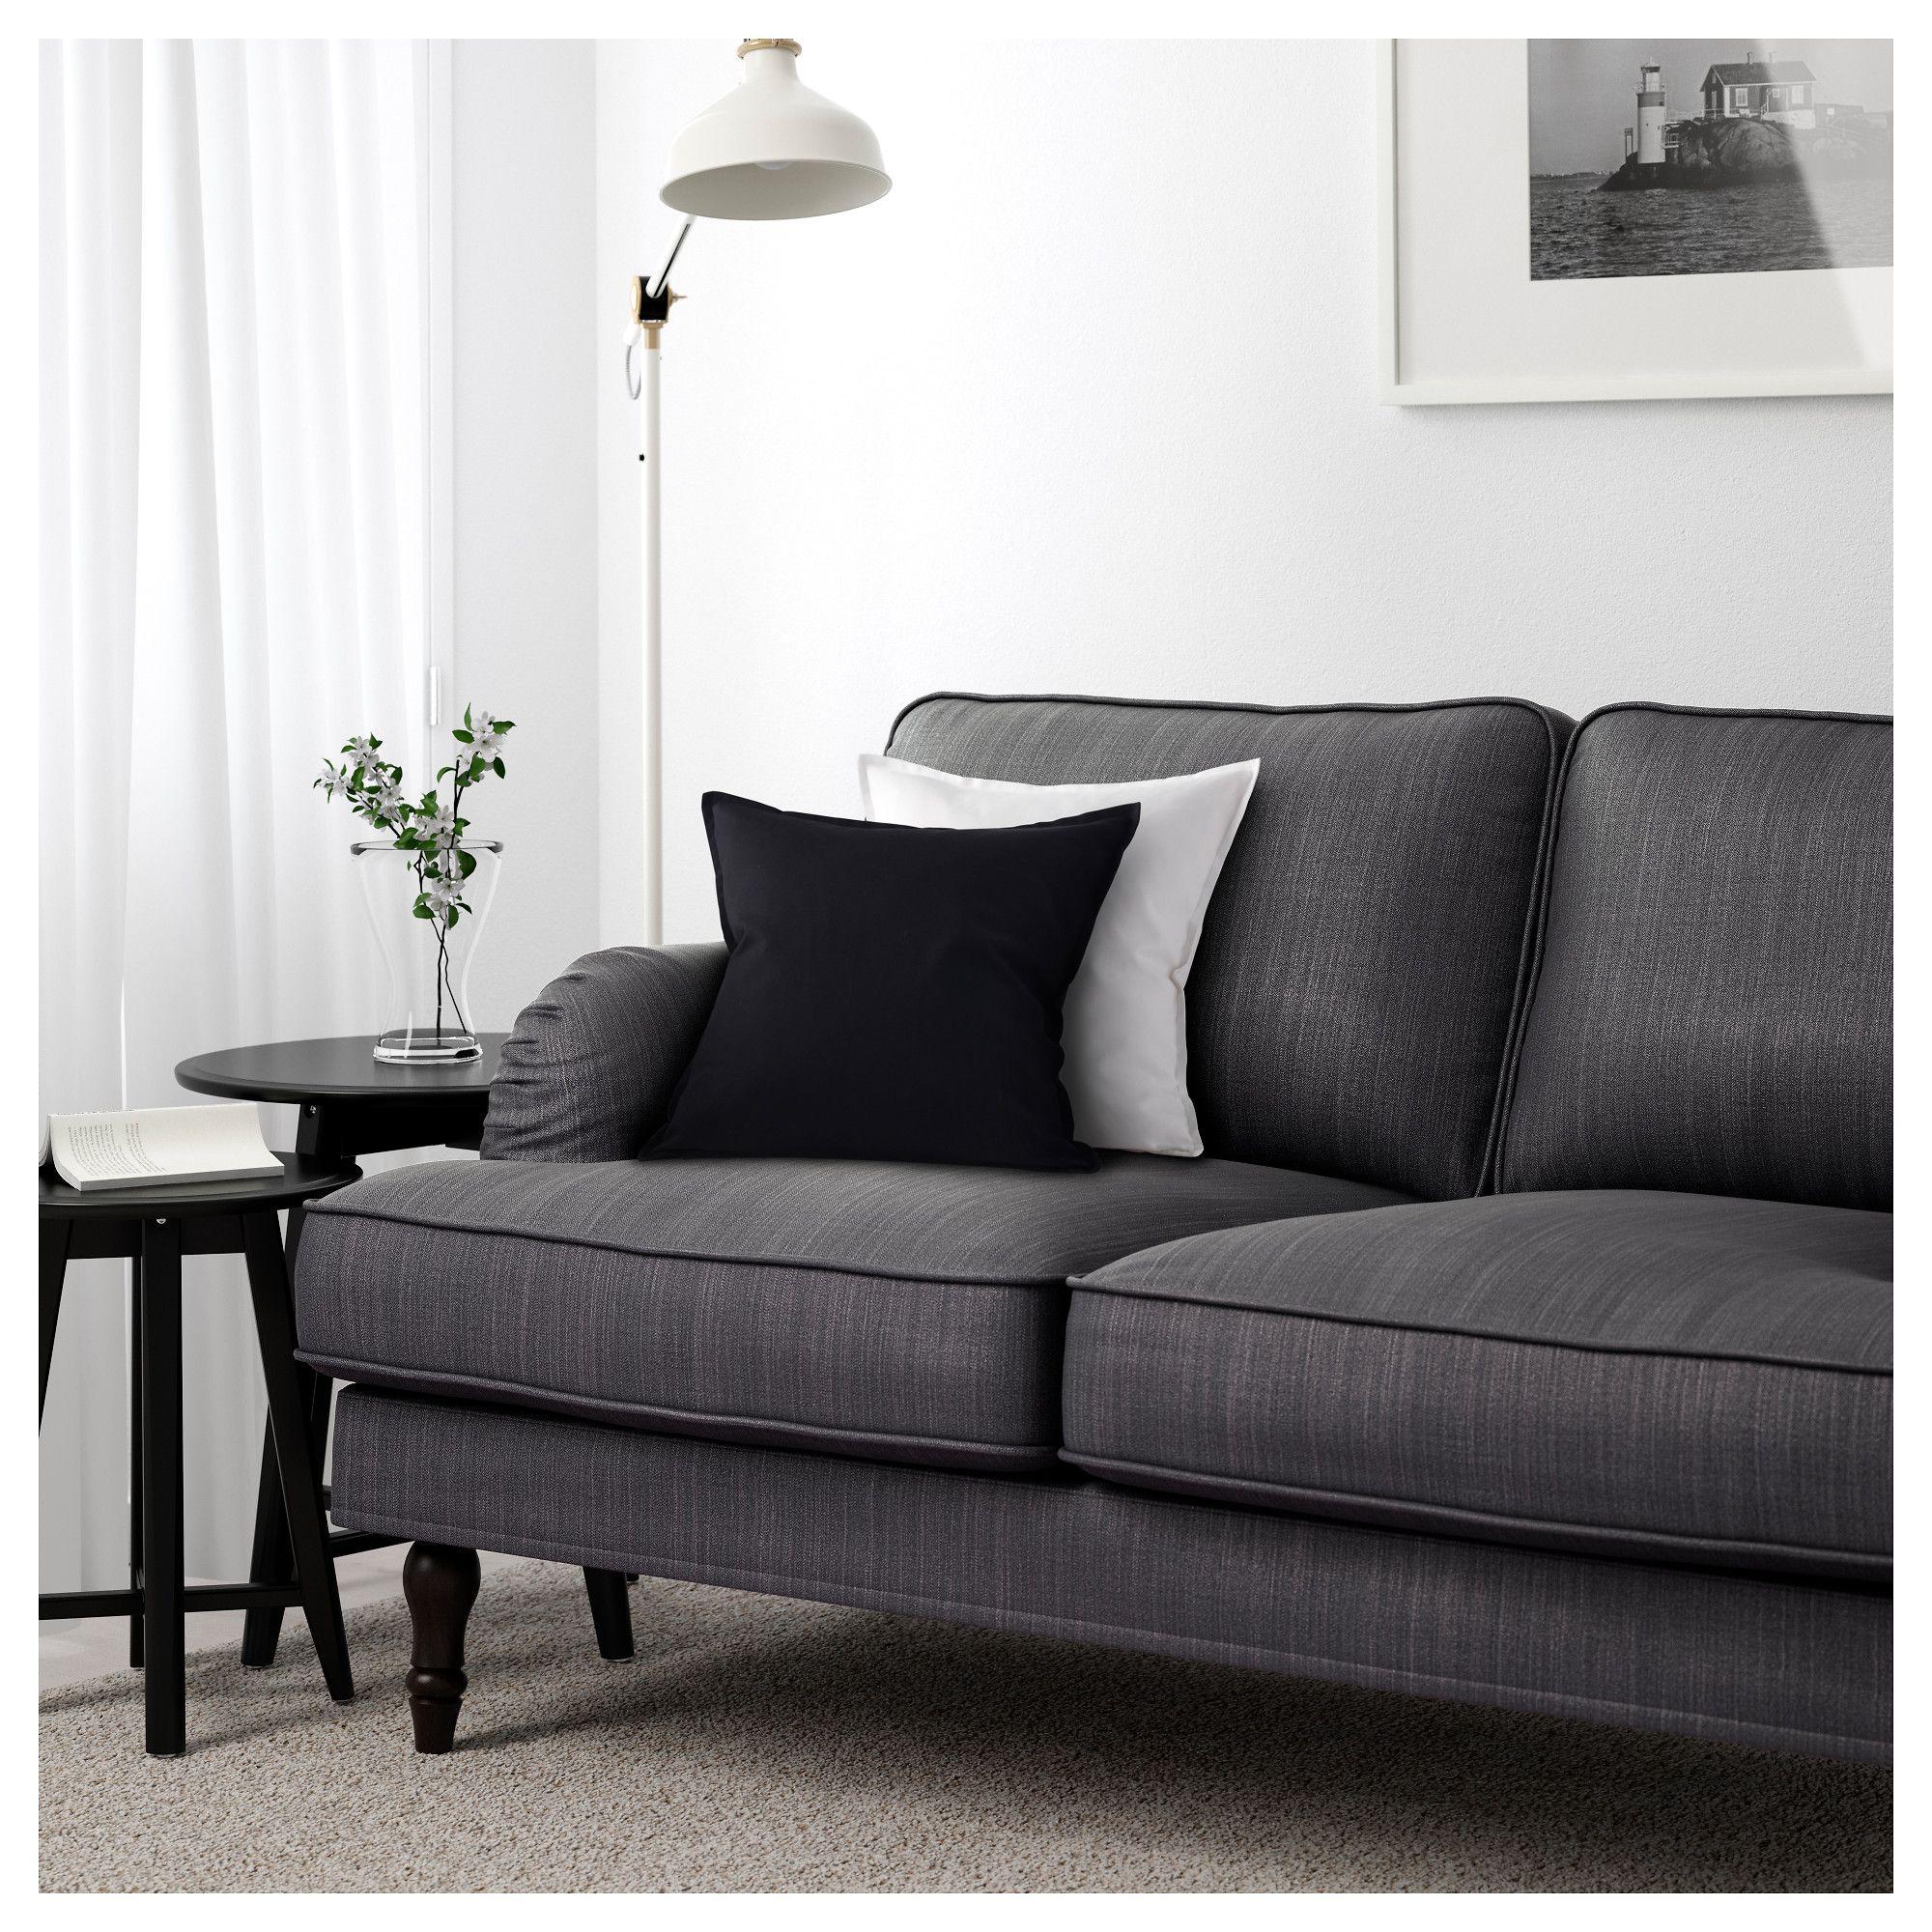 IKEA STOCKSUND Three Seat Sofa 10 Year Guarantee Read About The Terms In Brochure